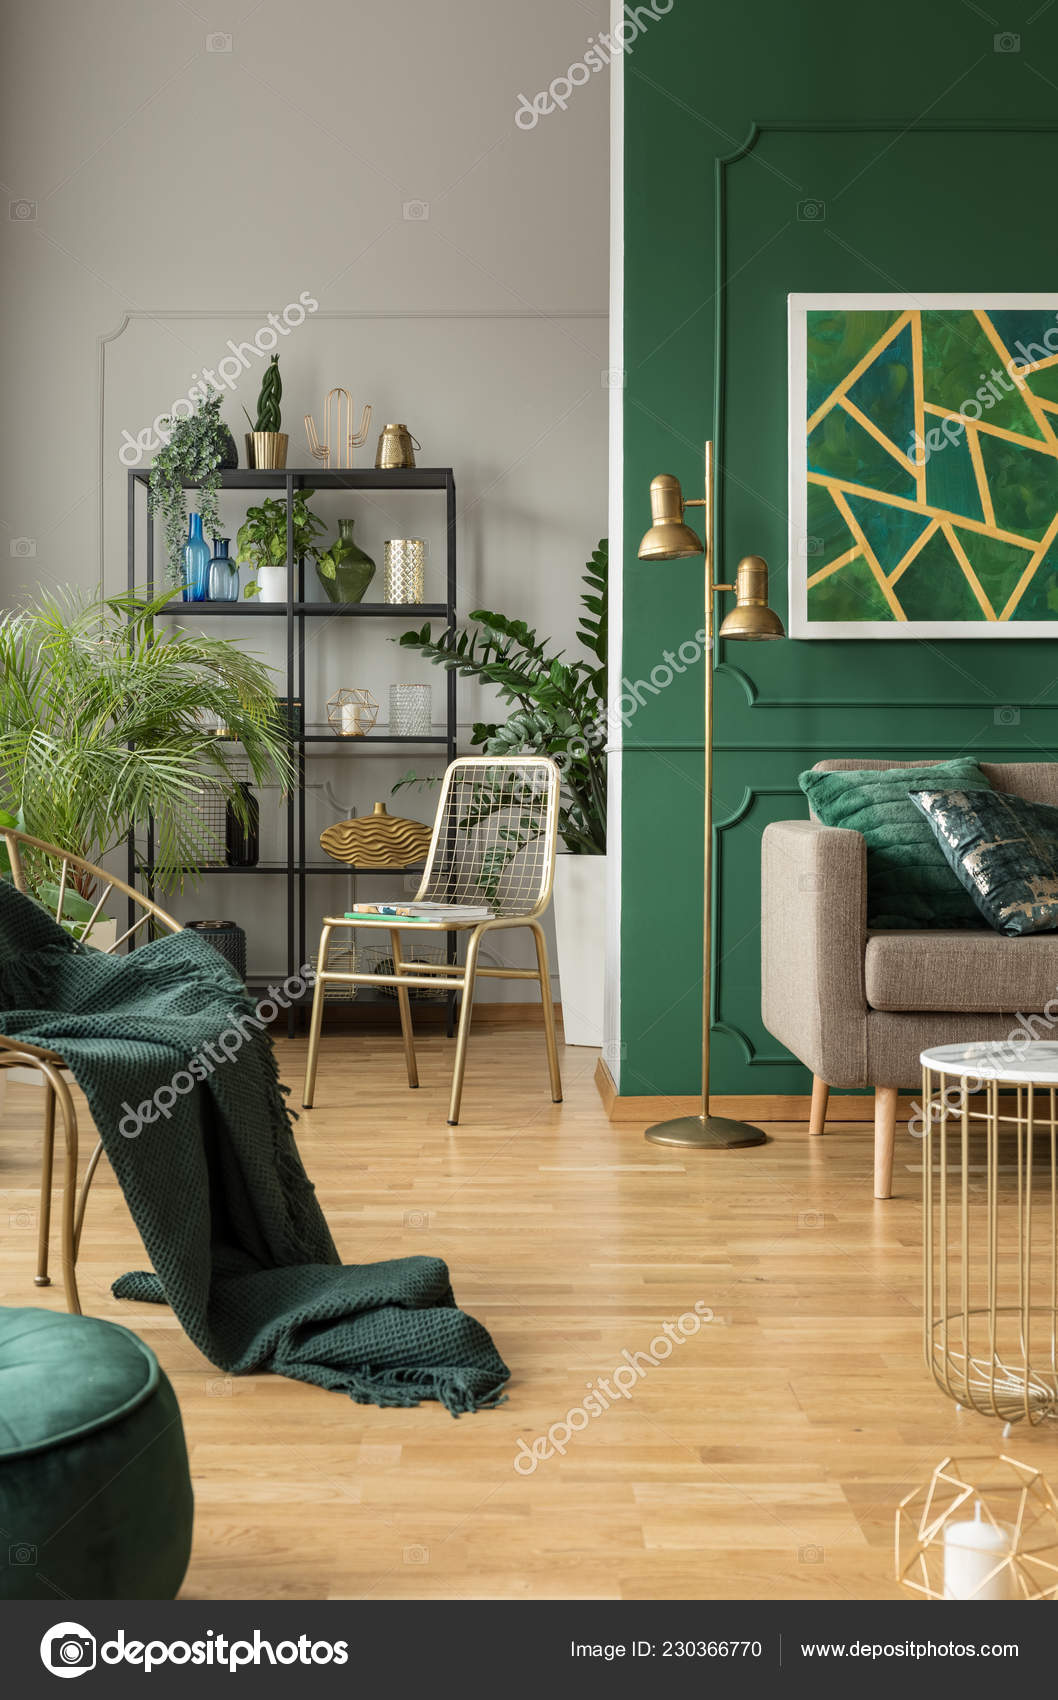 Emerald Green And Blue Living Room Emerald Green Interior Grey Accents Urban Jungle Fancy Furniture Stock Photo C Photographee Eu 230366770